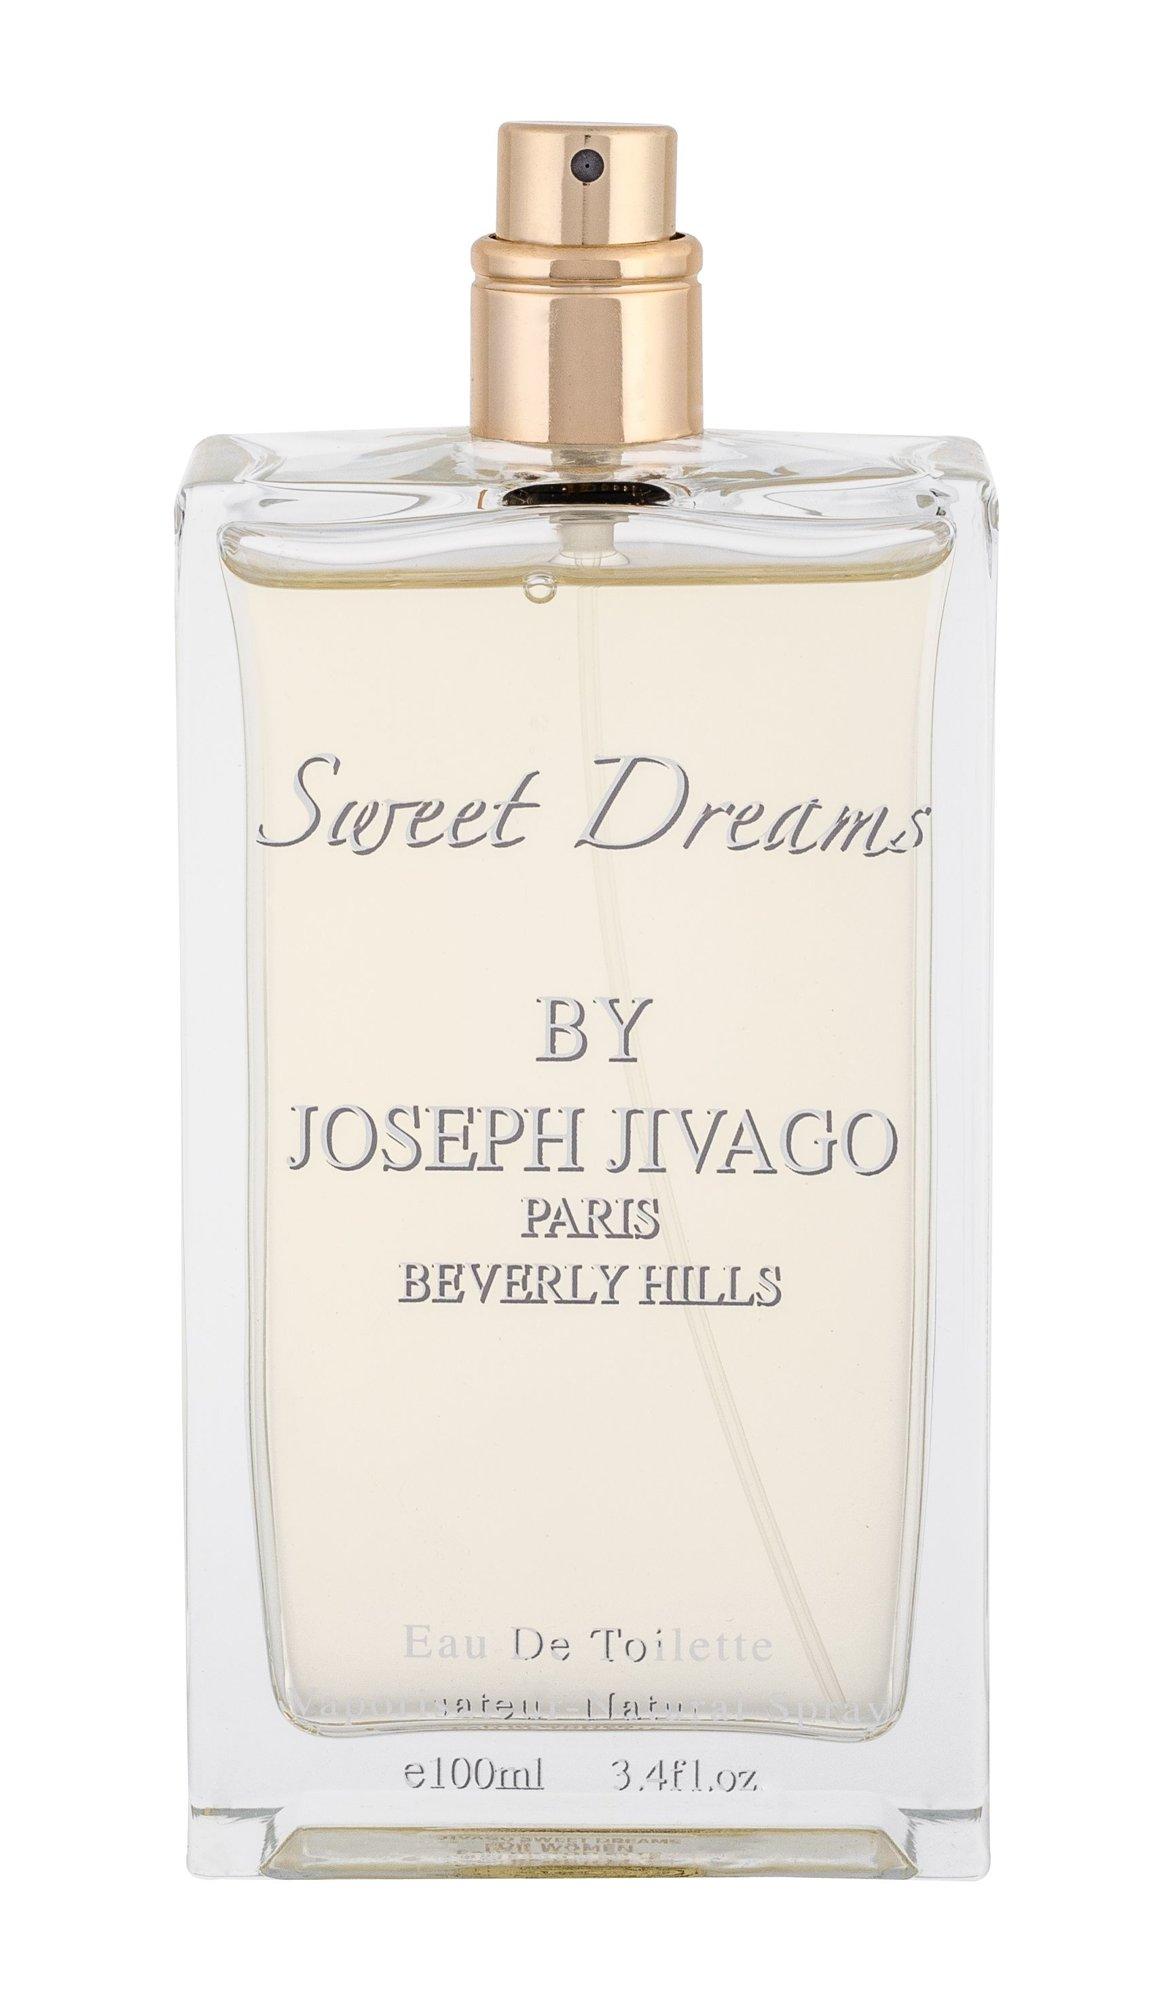 Joseph Jivago Sweet Dreams Eau de Toilette 100ml